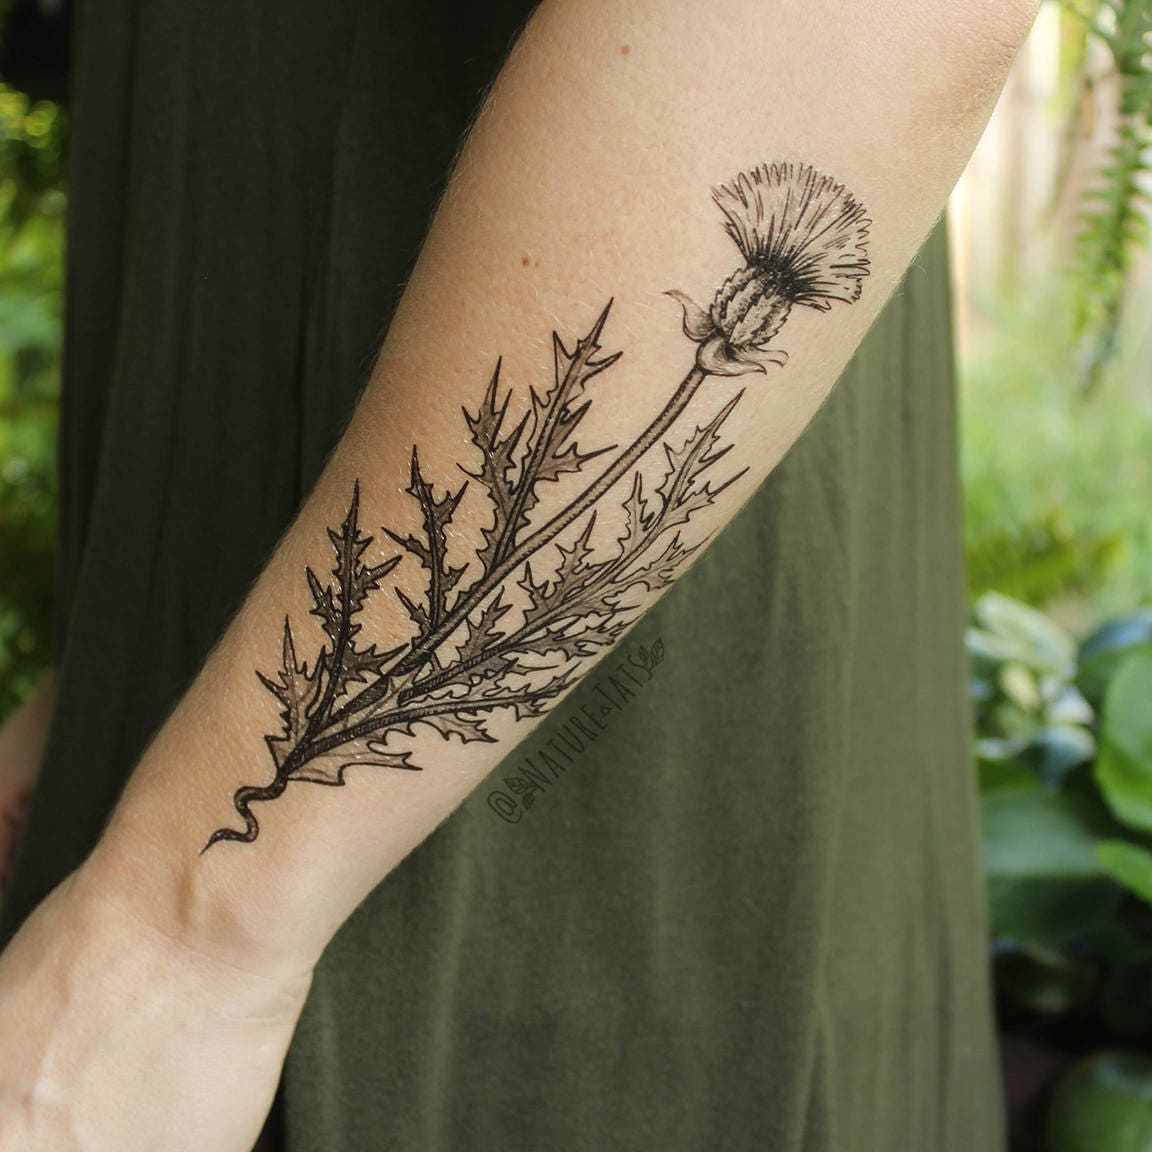 Flower Nature Tattoo: Purple Thistle Flower Temporary Tattoo Black Line Drawing